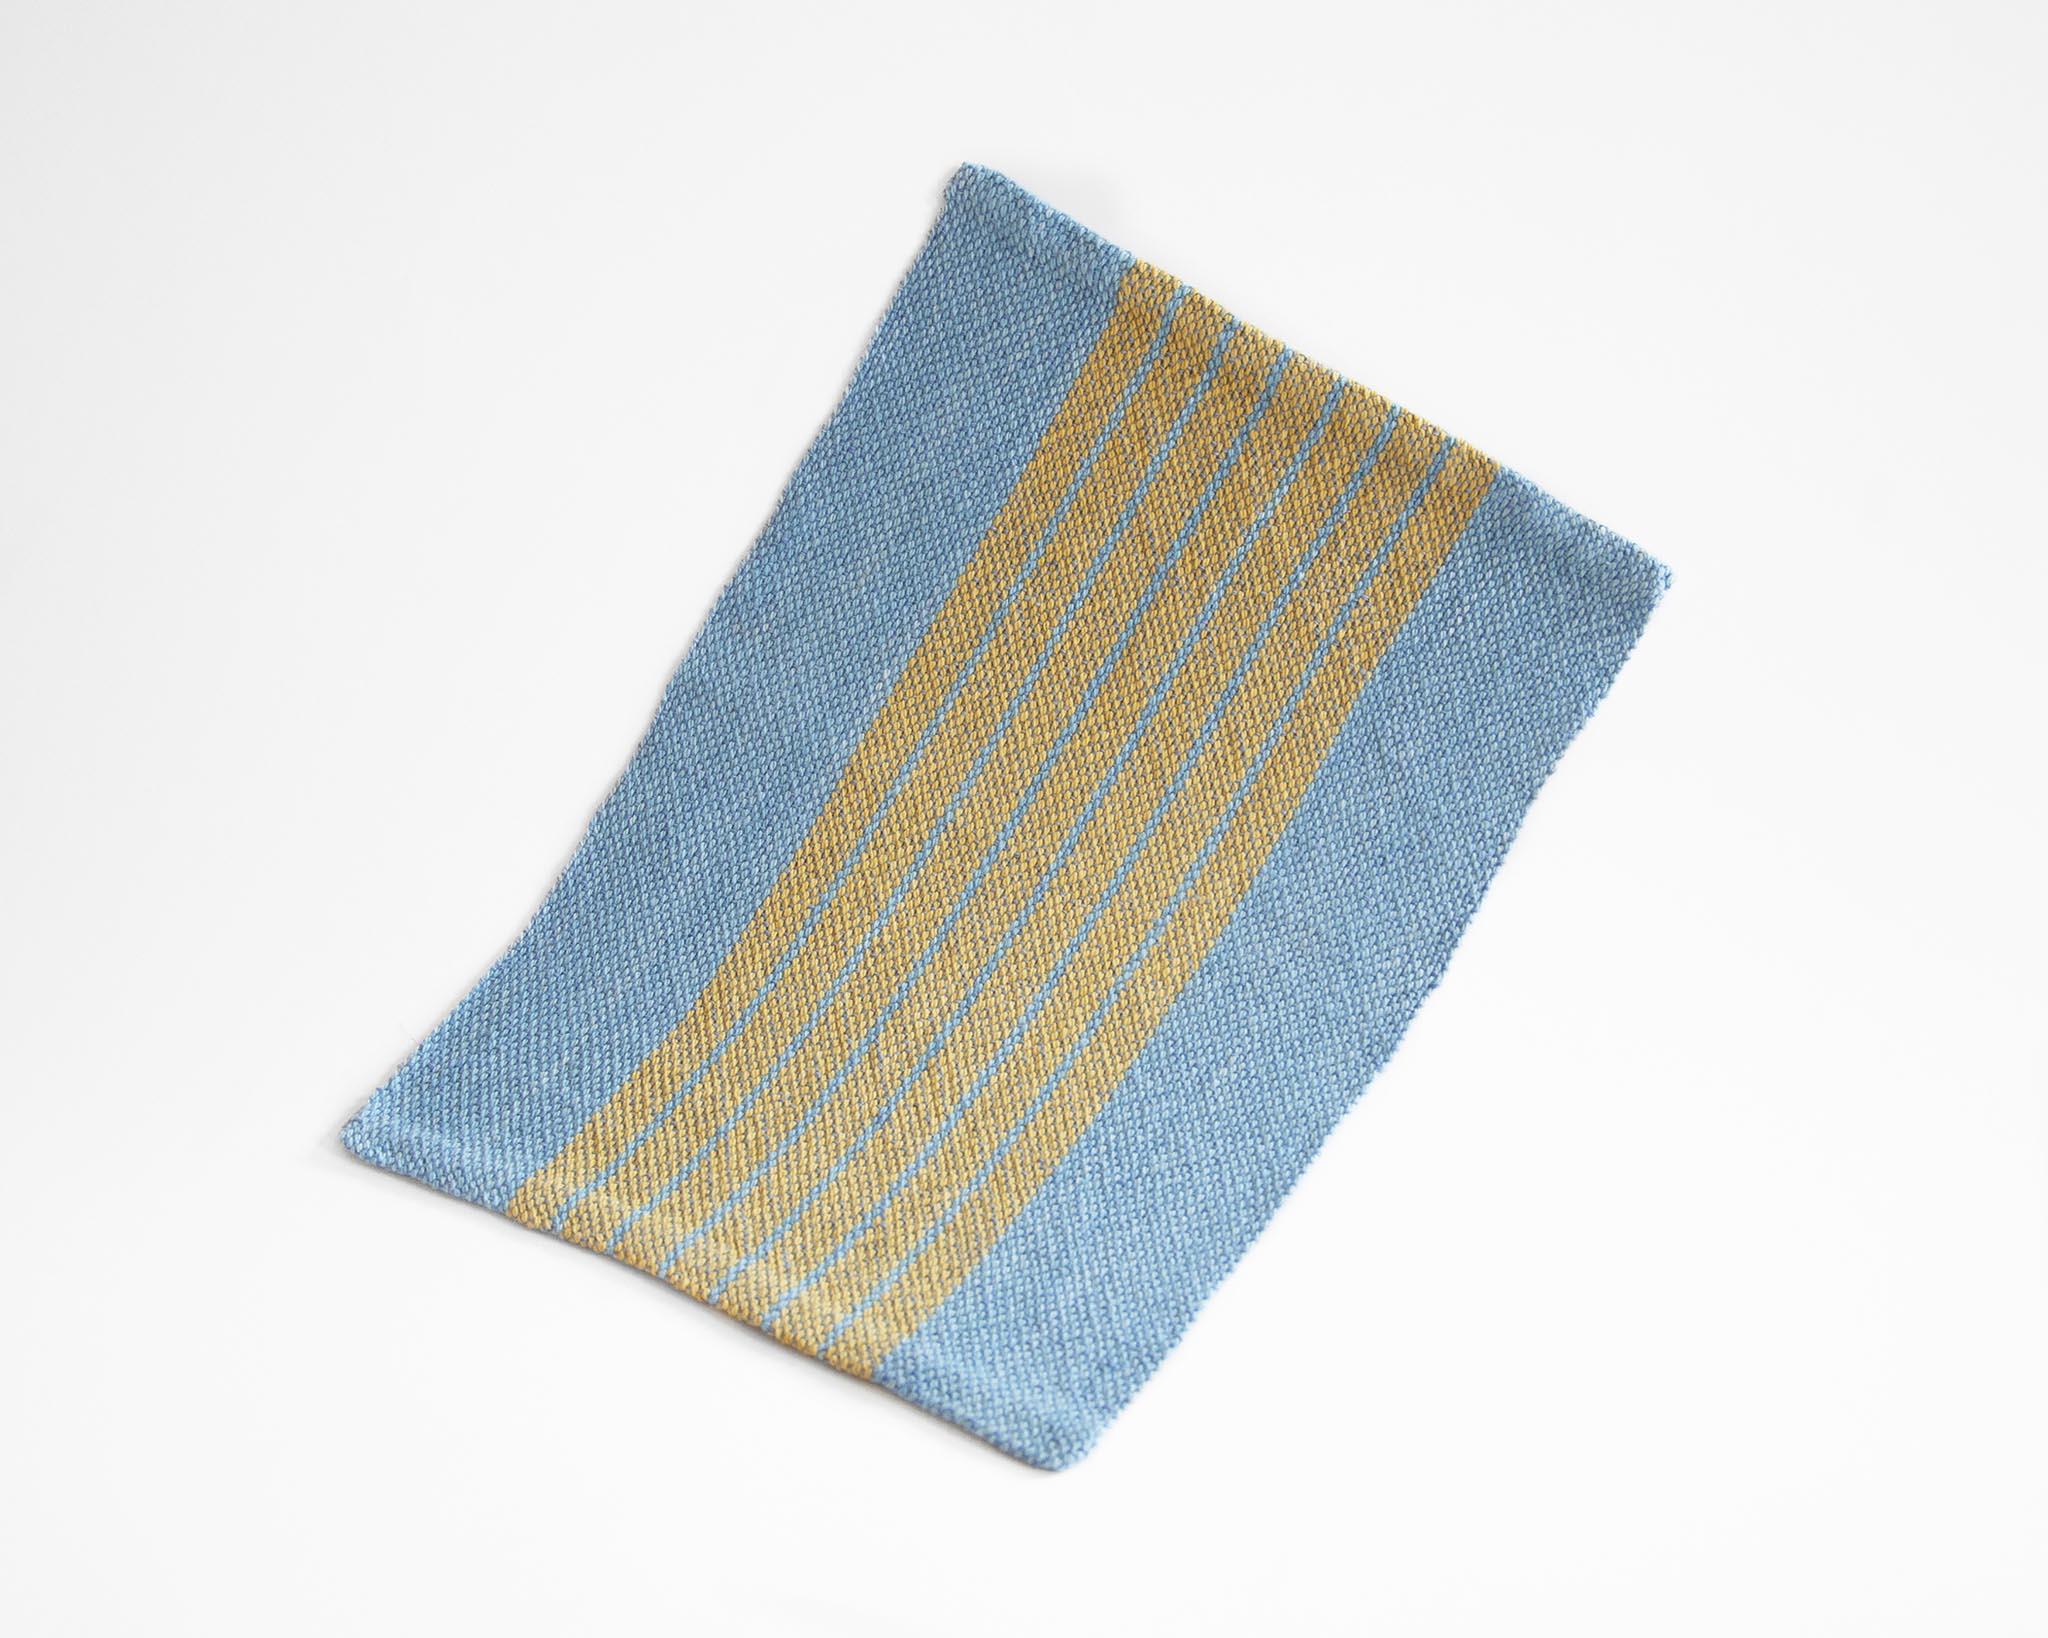 Weaver's PlayBox for Beginning and Intermediate Rigid Heddle Loom Weavers